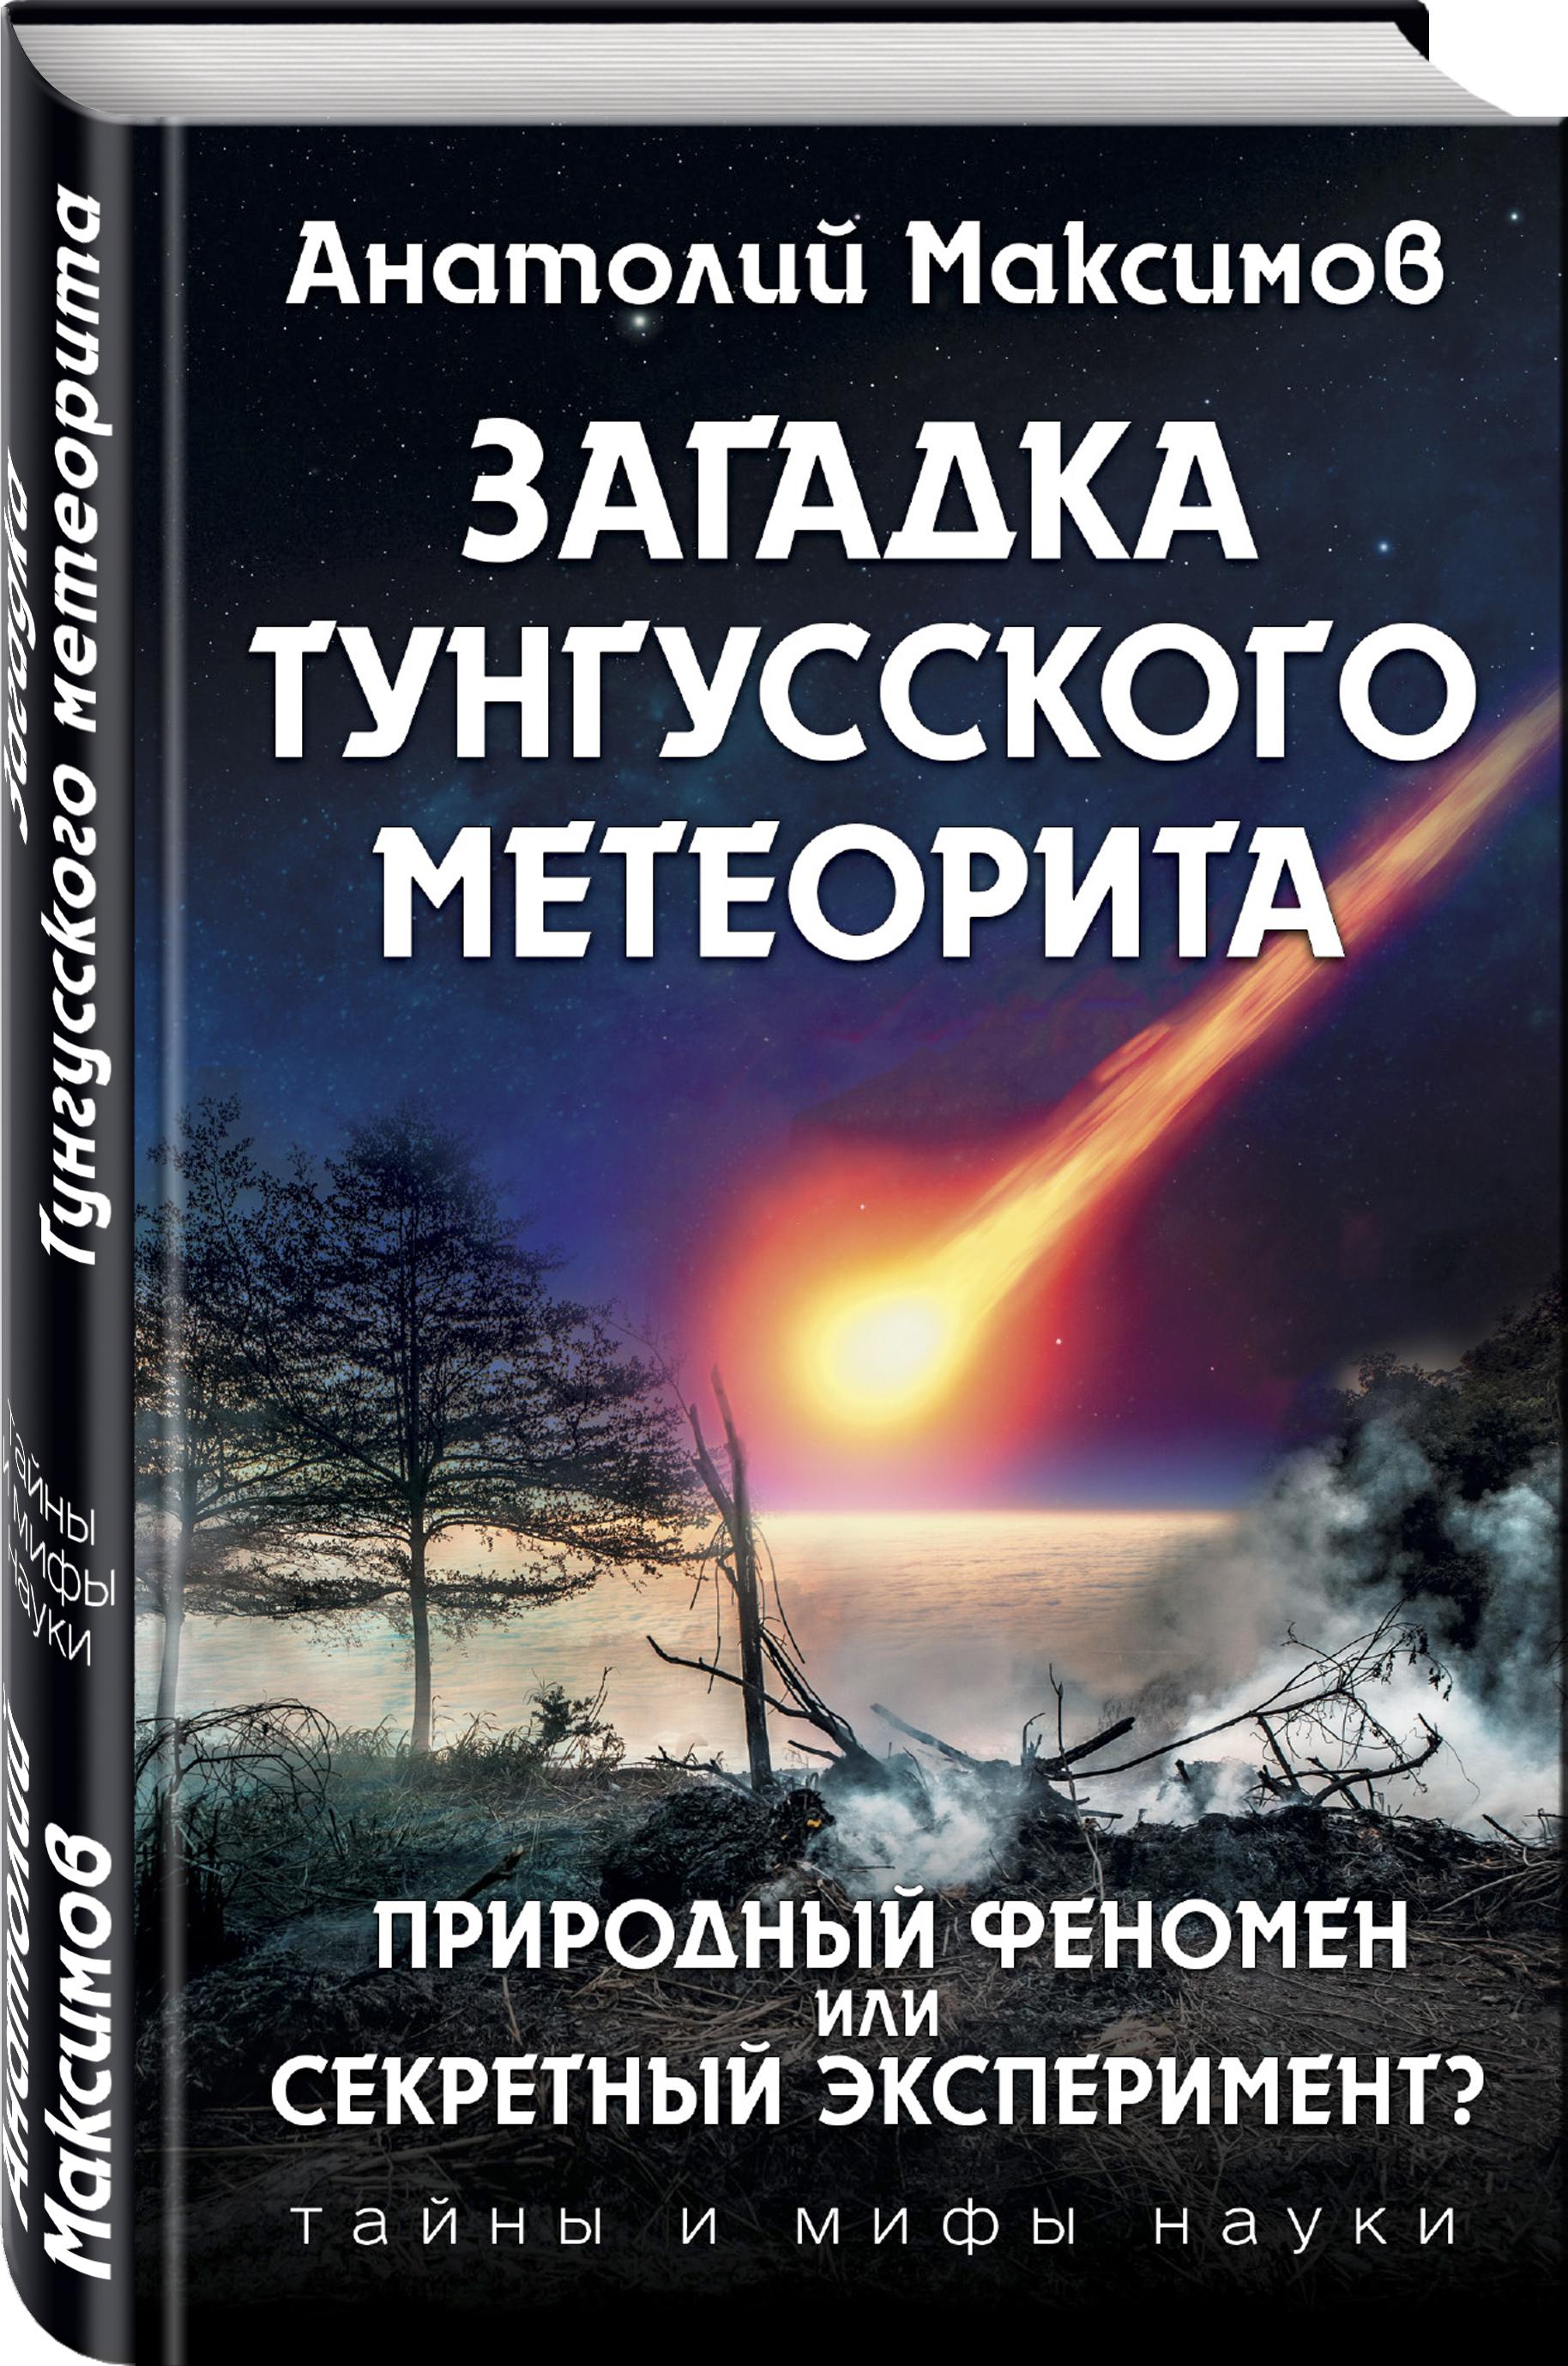 Загадка Тунгусского метеорита от book24.ru